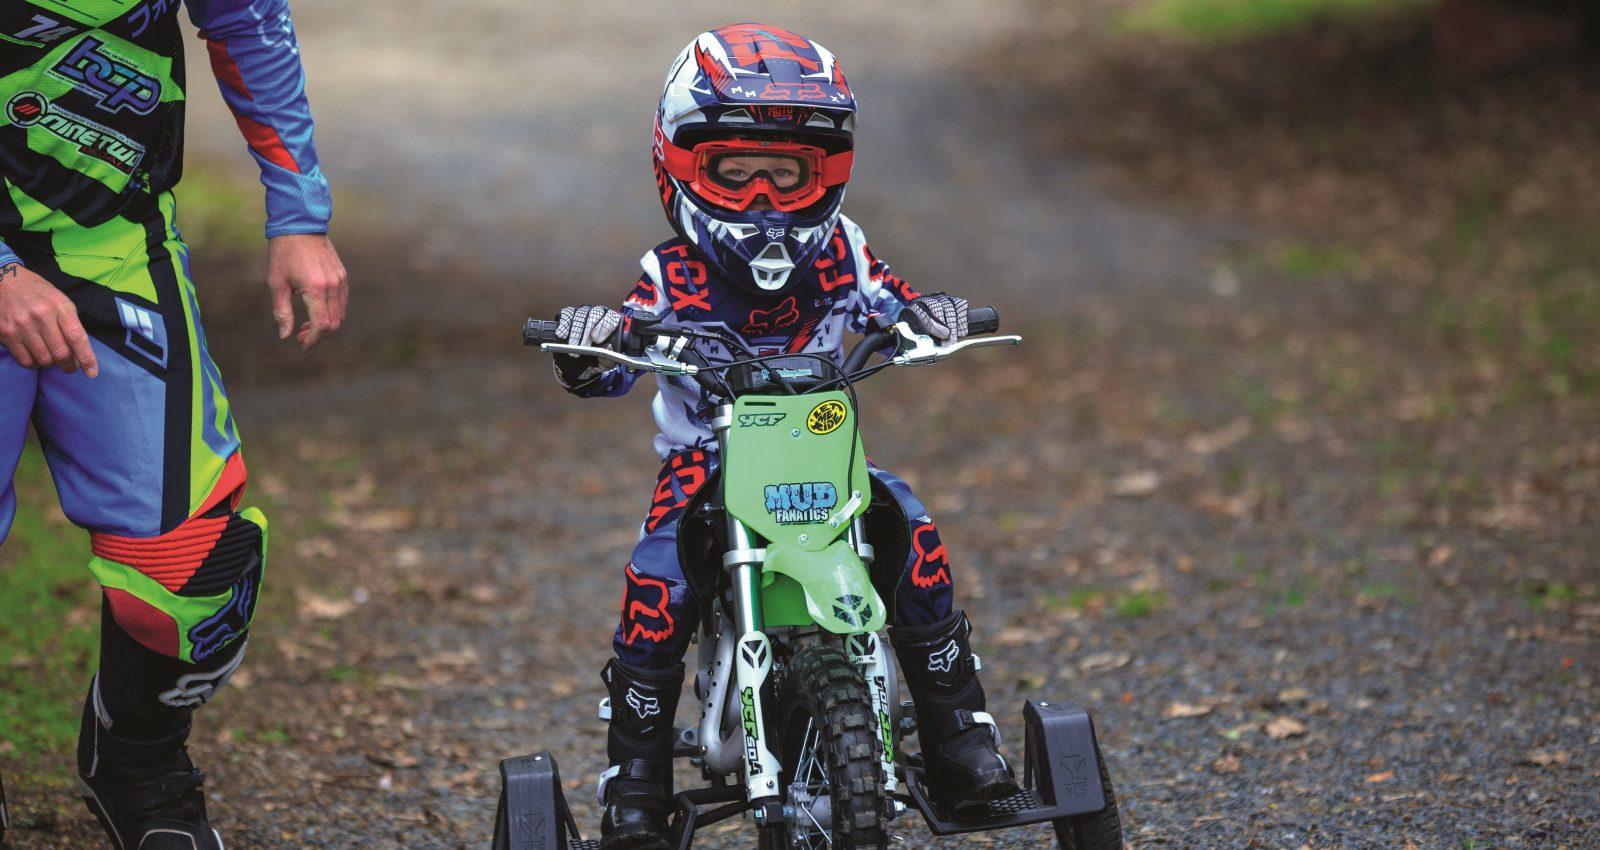 2015 YCF 50A Kids Test - Australasian Dirt Bike Magazine